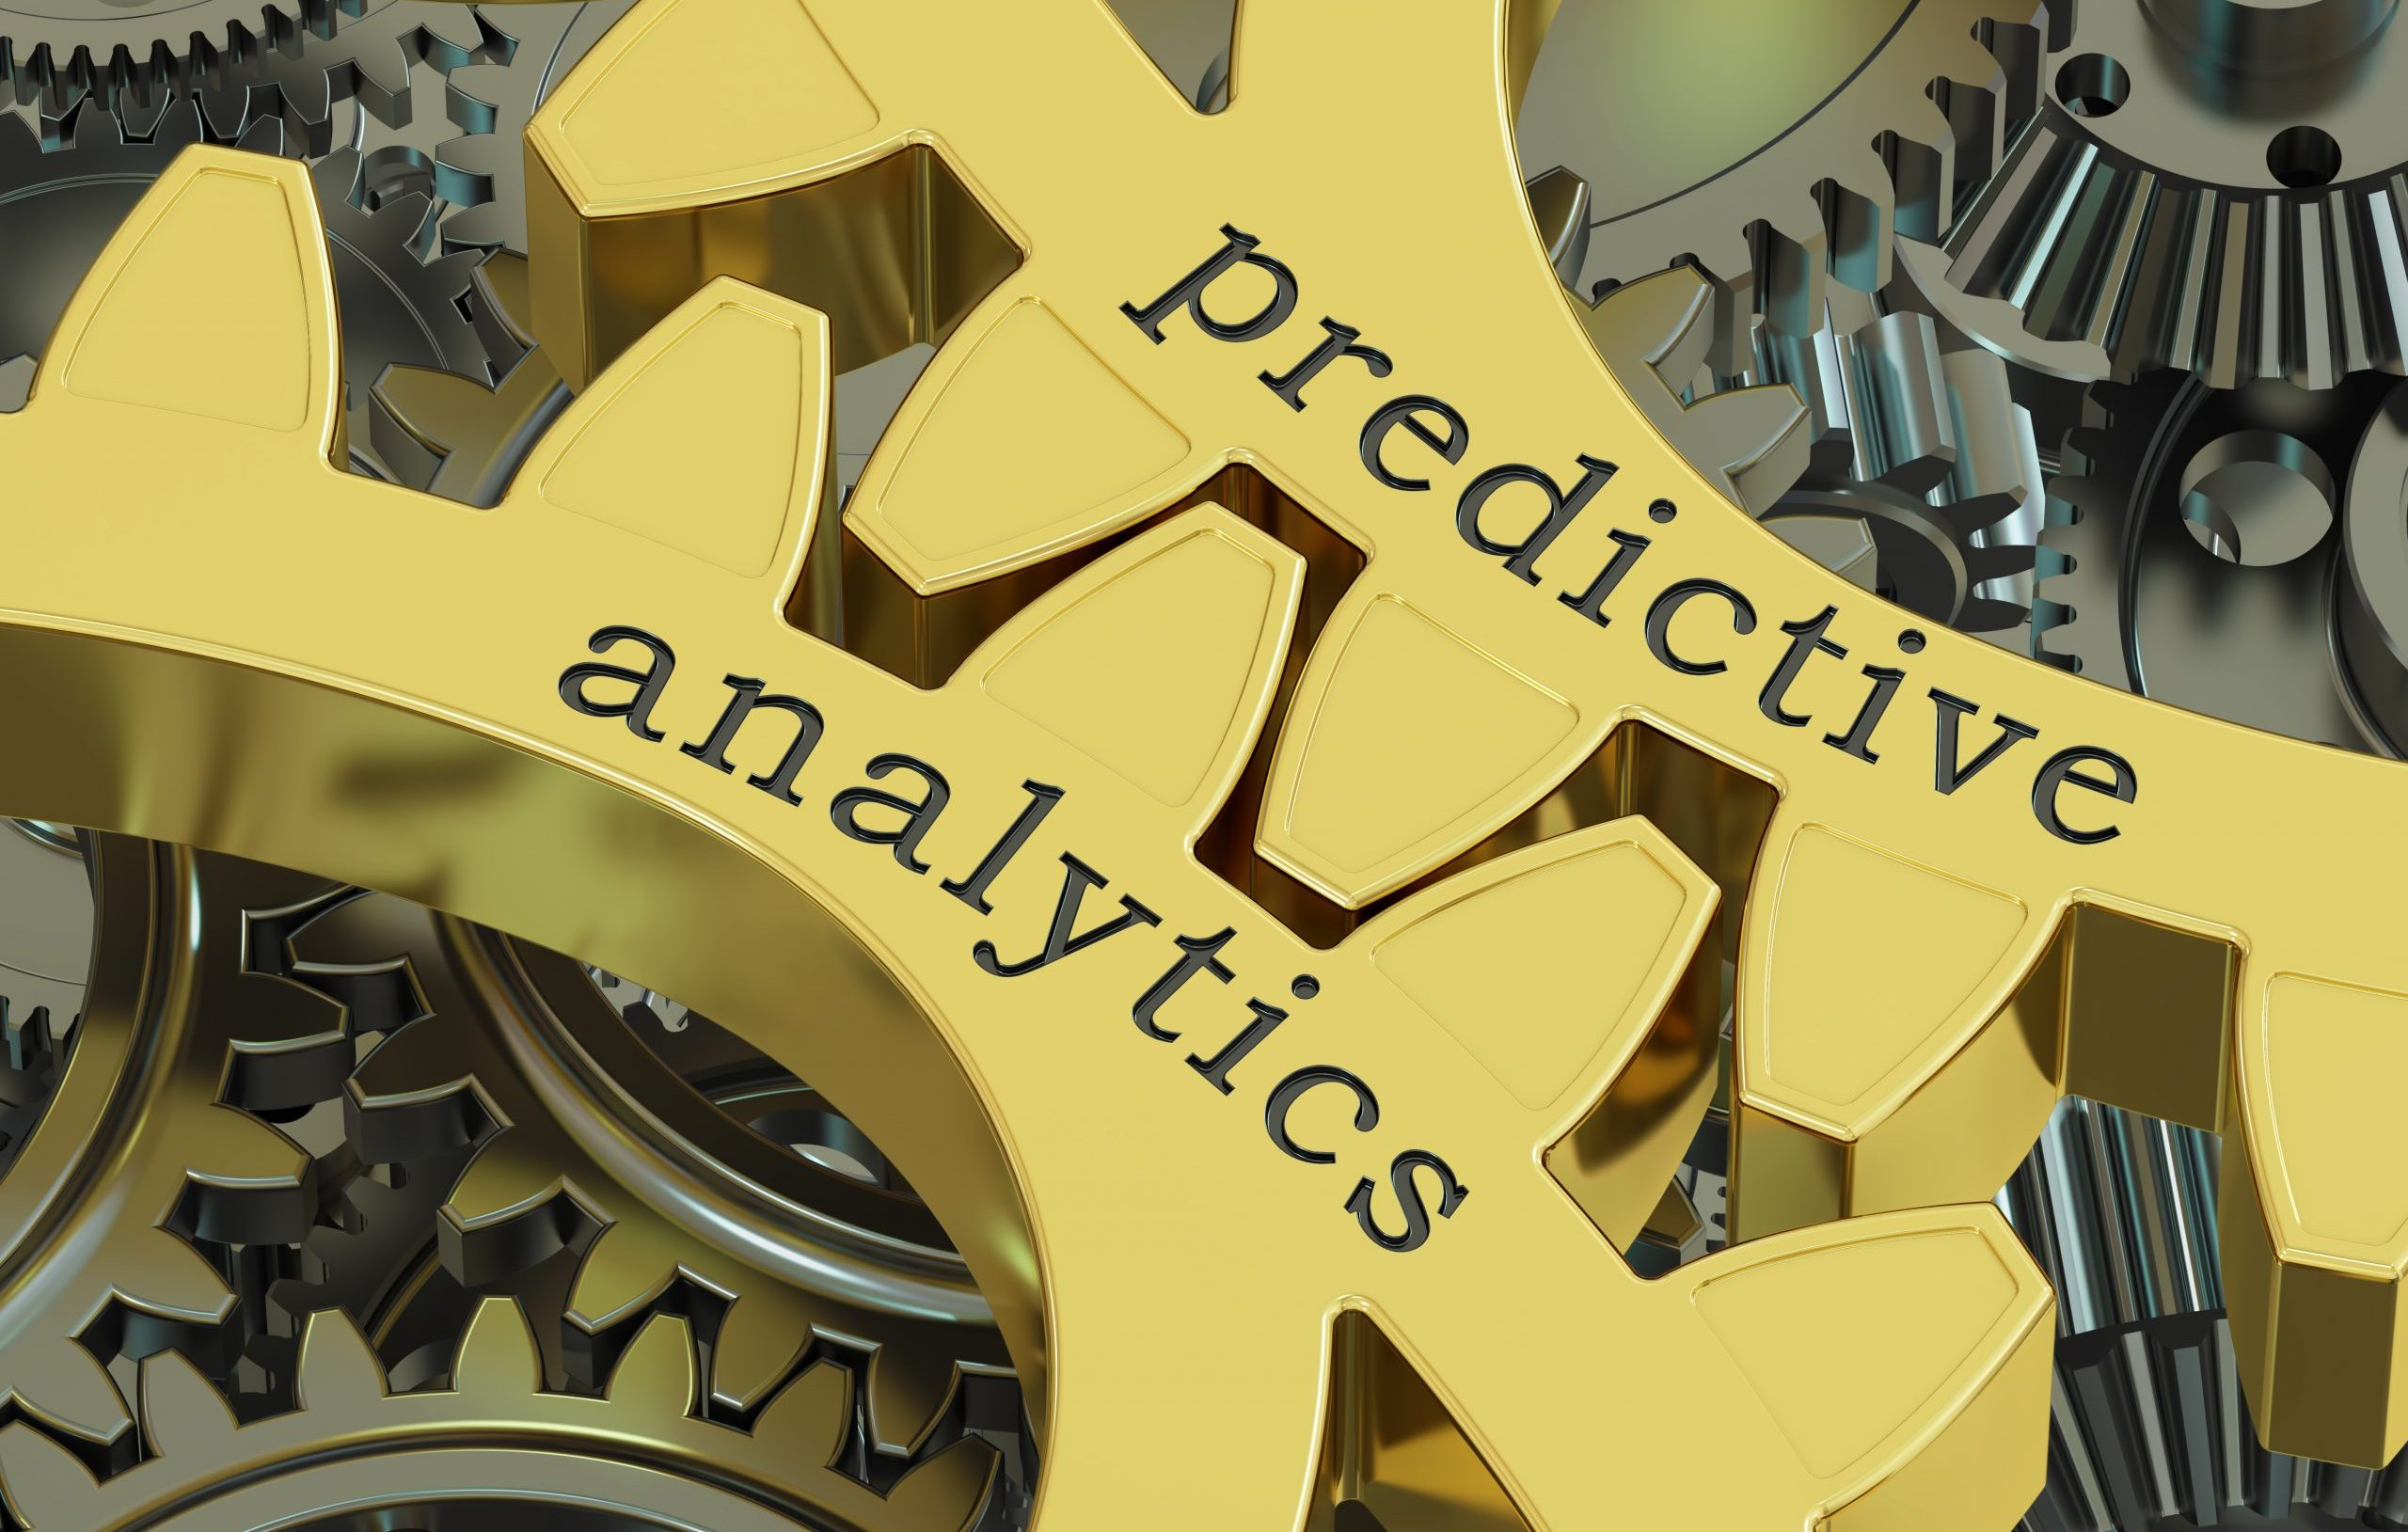 rmda-ss-predictive-analytics-gears.2560.1707